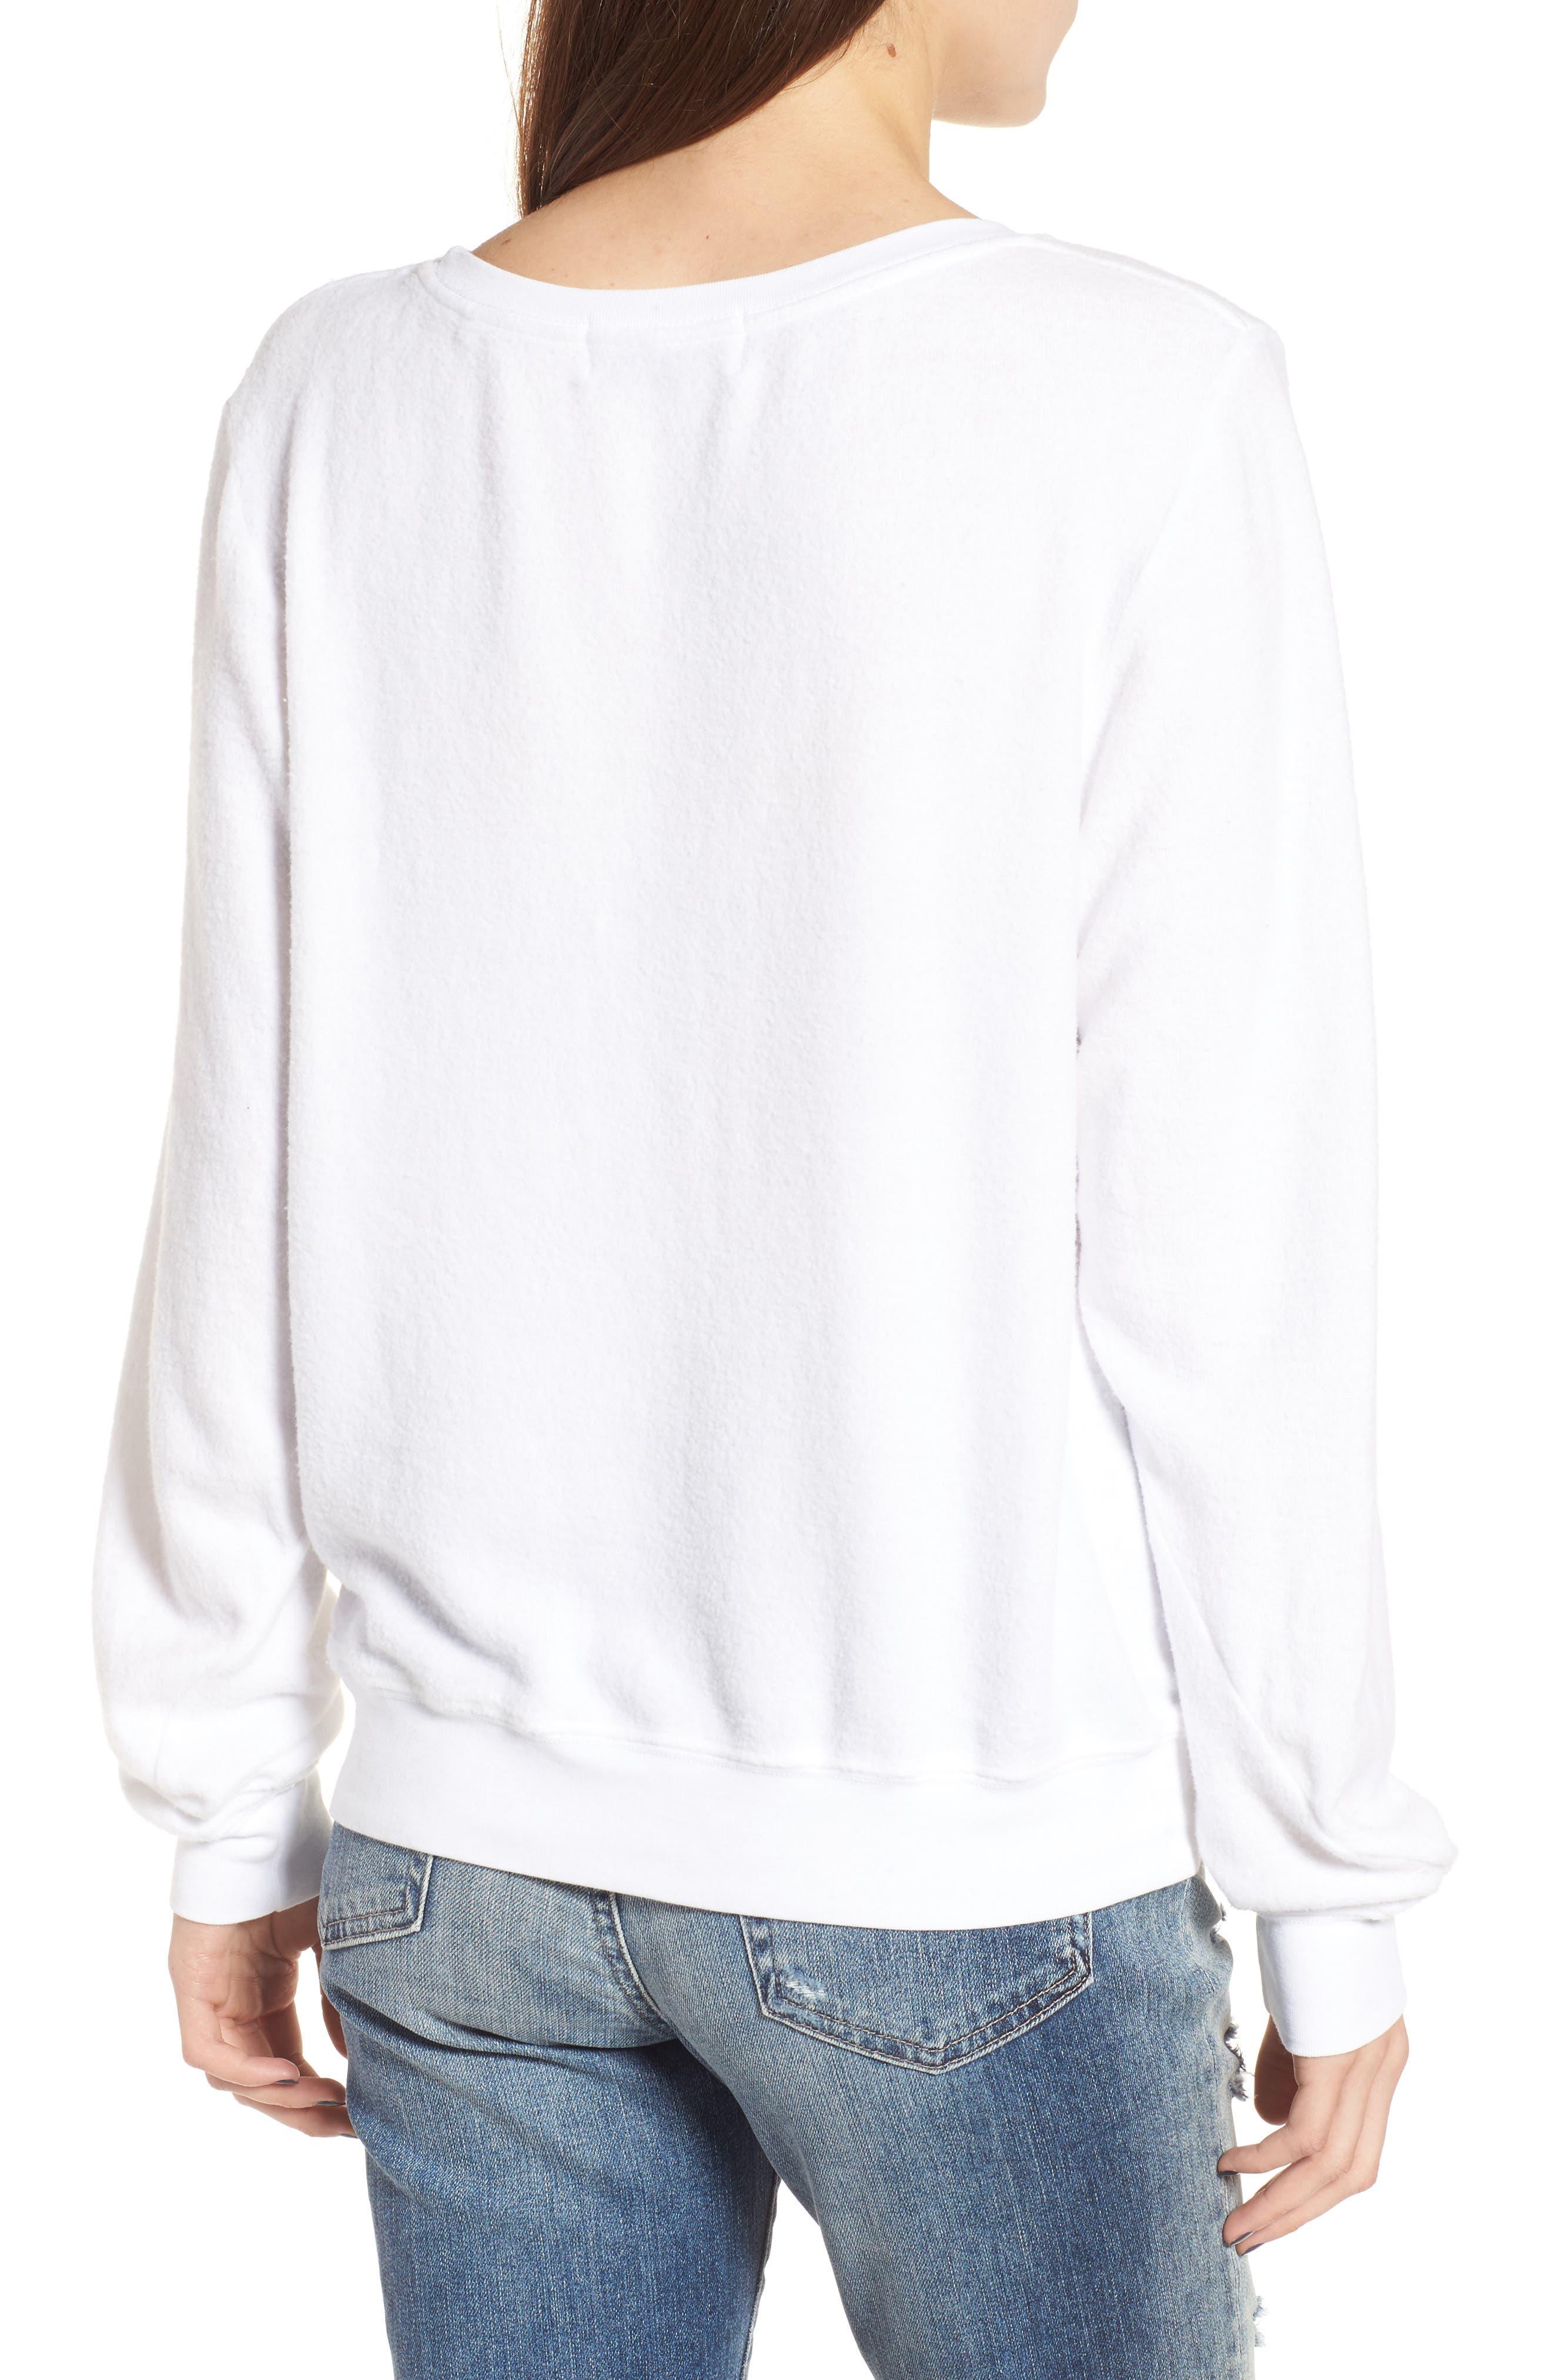 Beverly Hills Sweatshirt,                             Alternate thumbnail 2, color,                             100